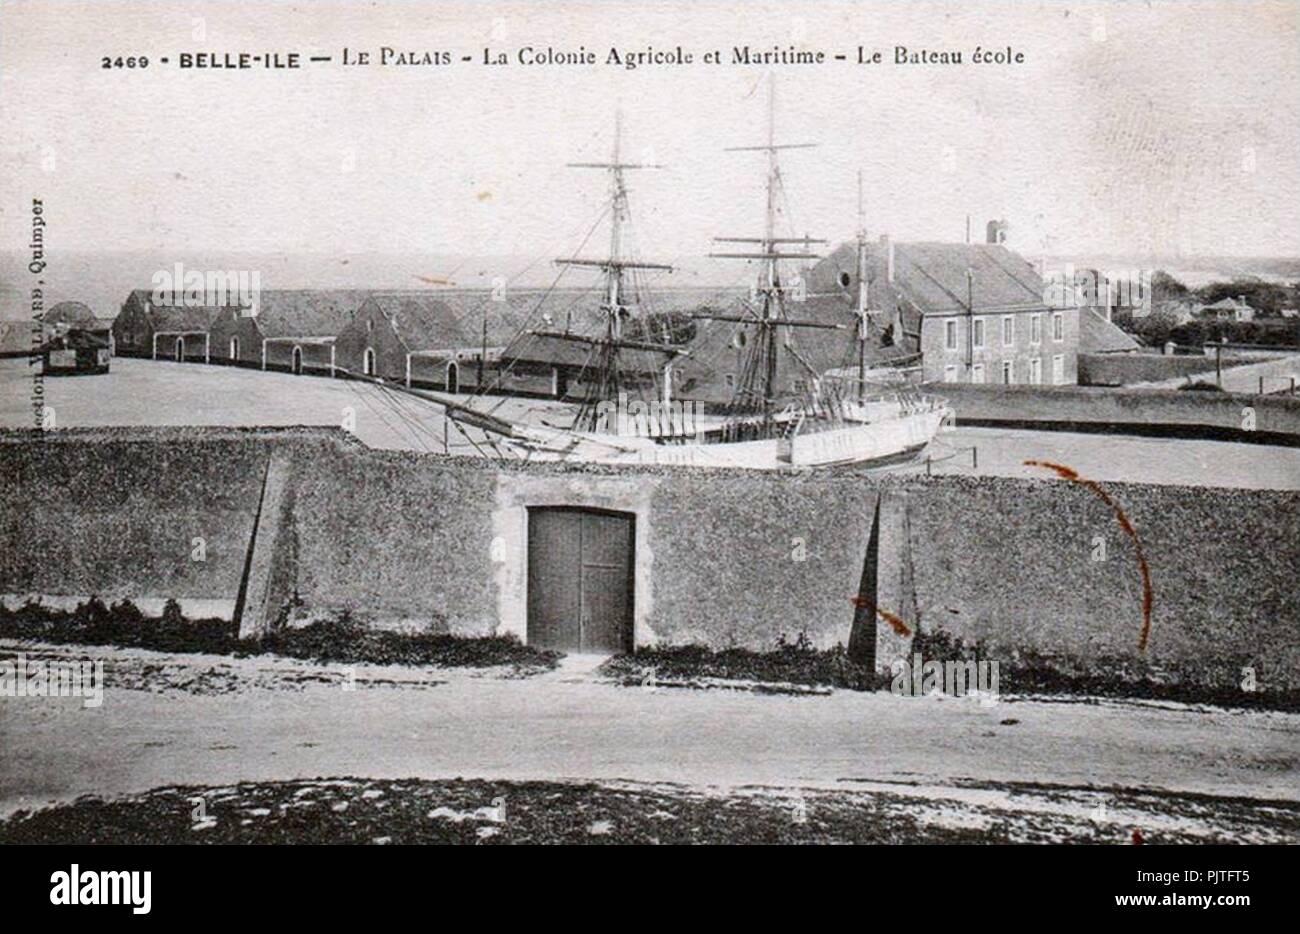 Belle-Ile 2469. - Stock Image